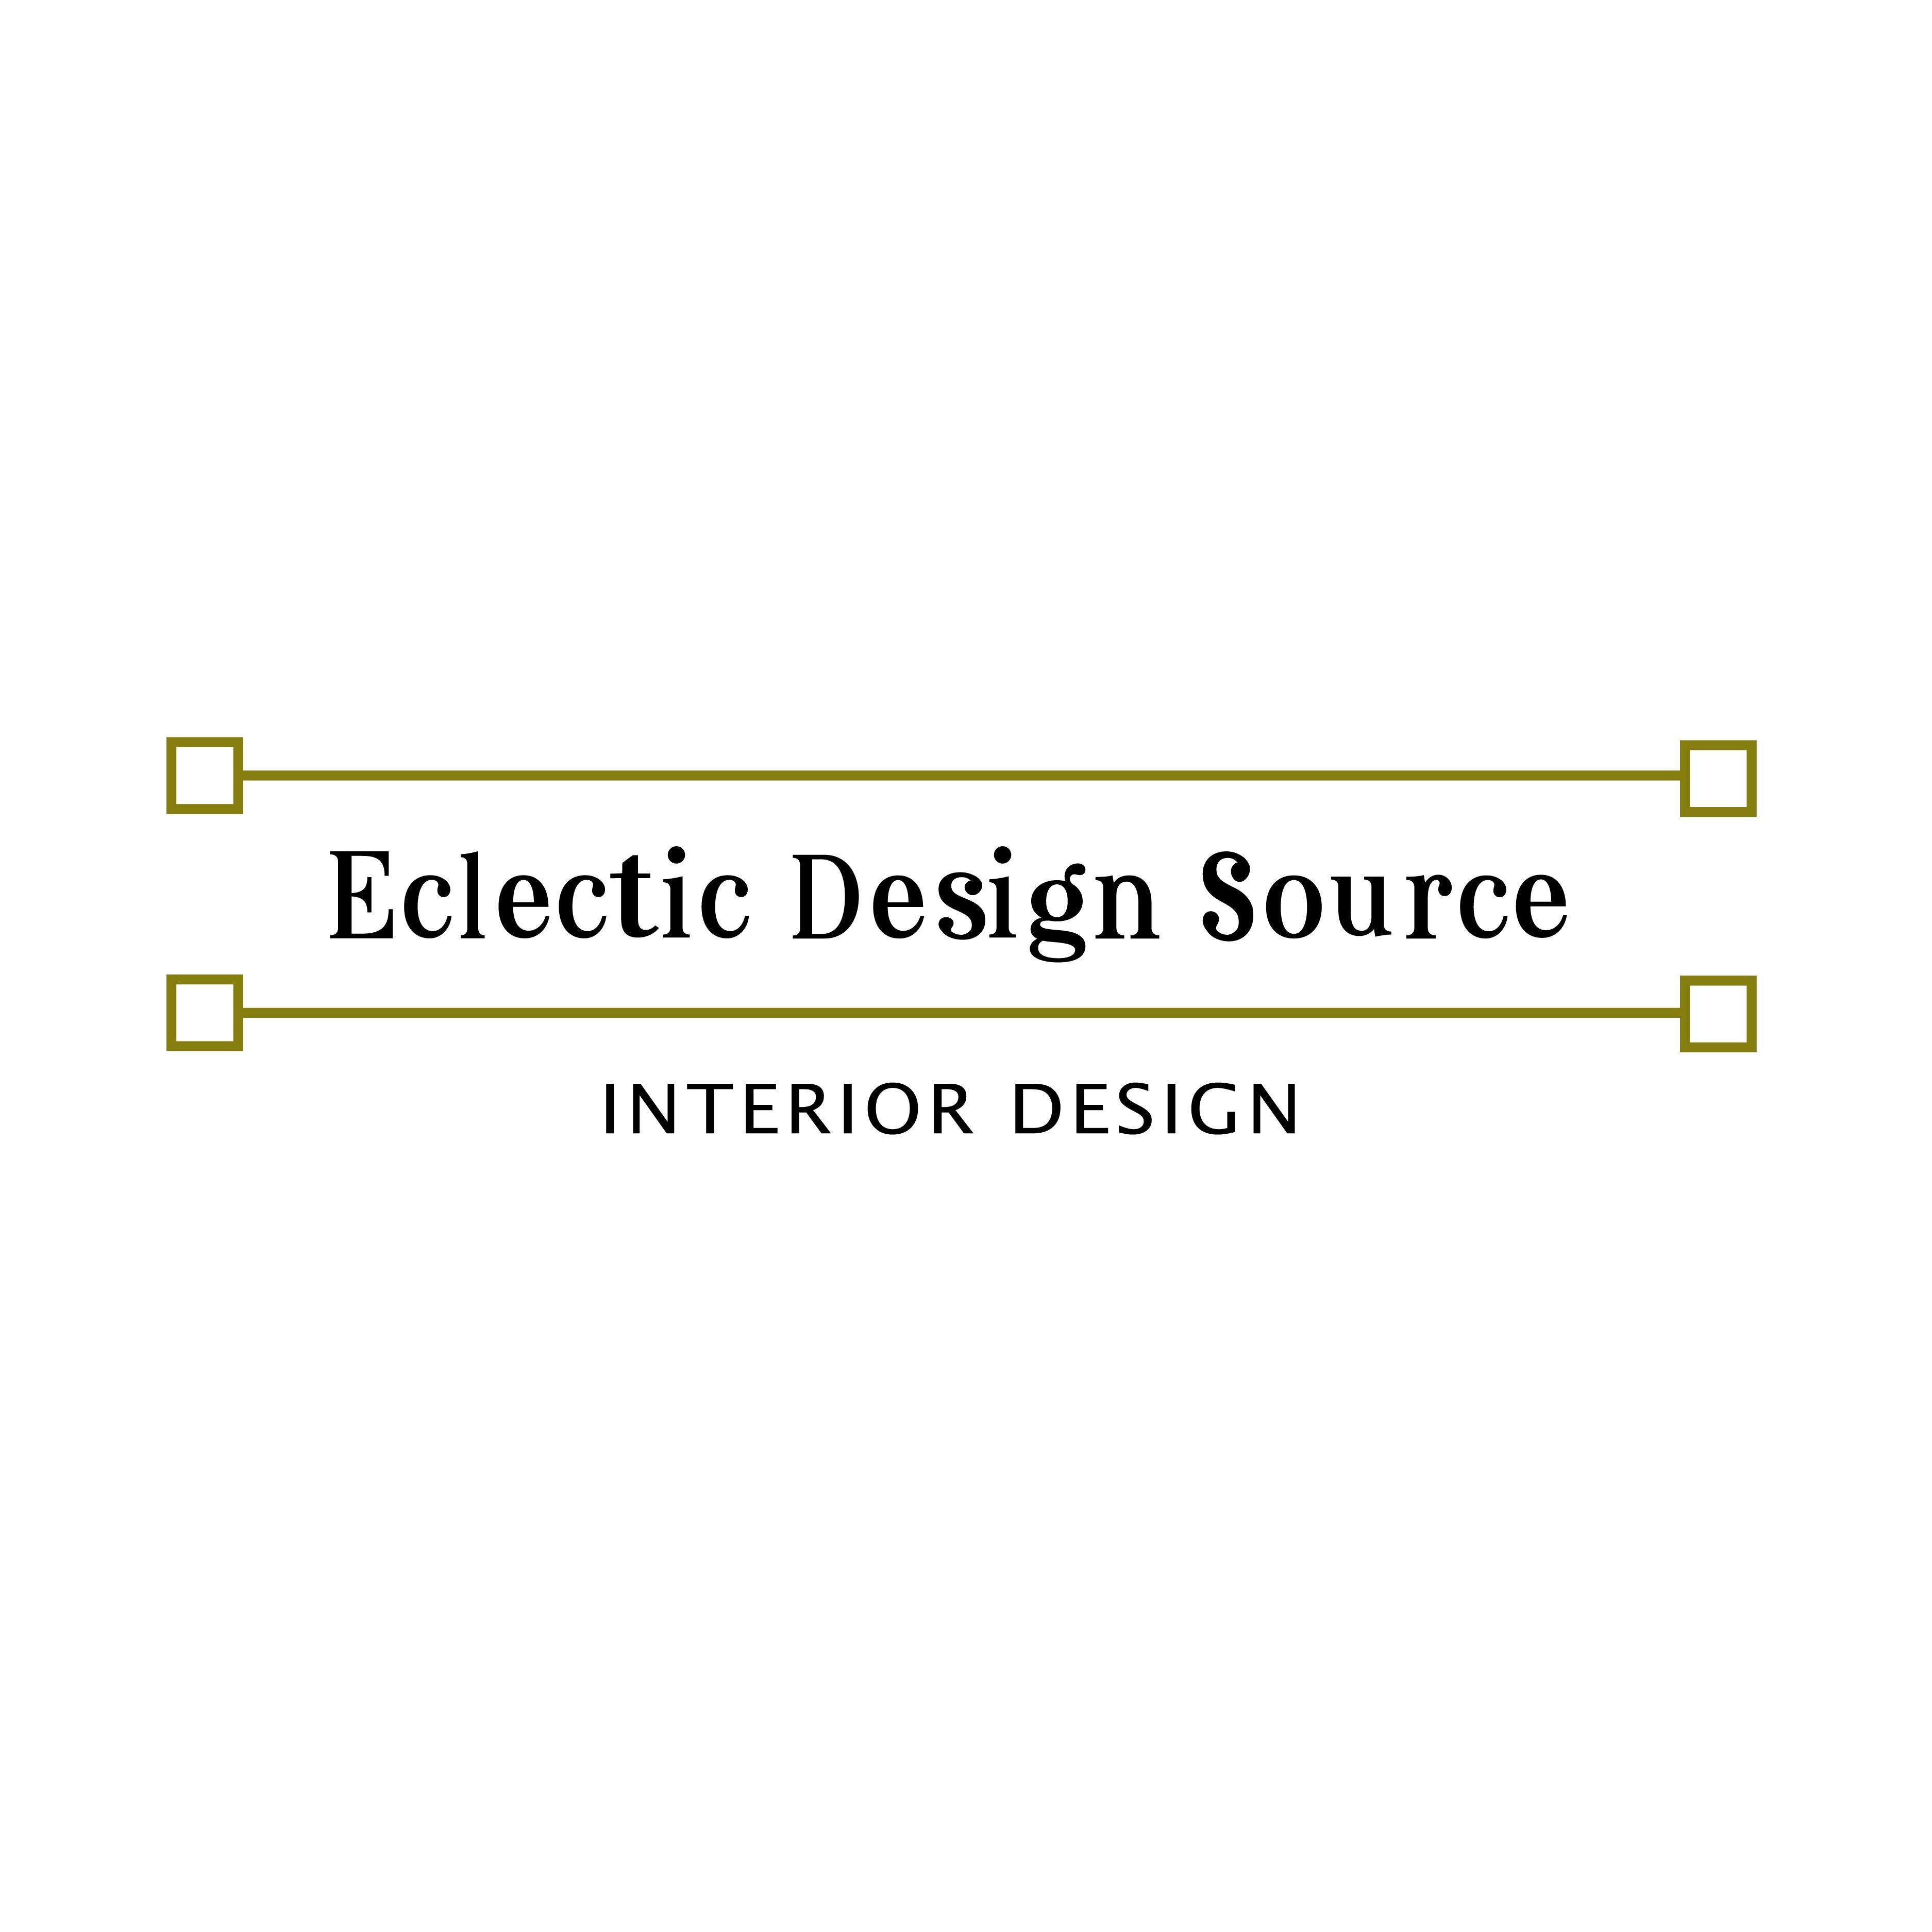 Eclectic Design Source, LLC